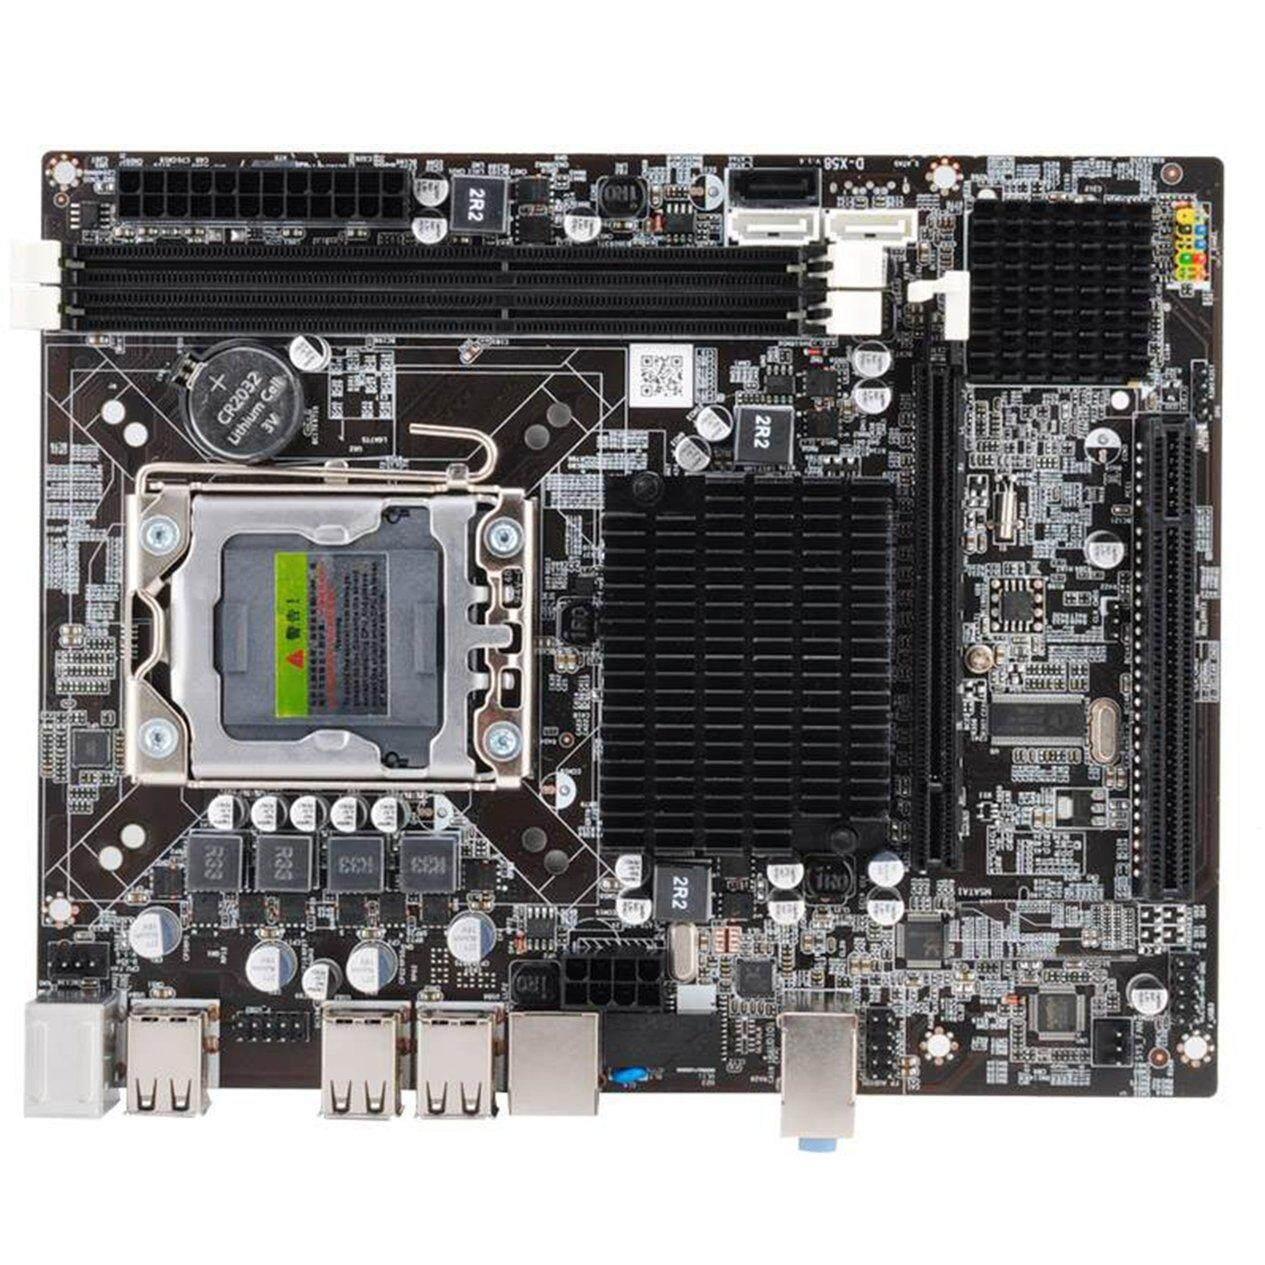 Hot Sale X58 PC Computer Motherboard LGA1366 CPU Interface DDR3 MSATA V1.6 Mainboard